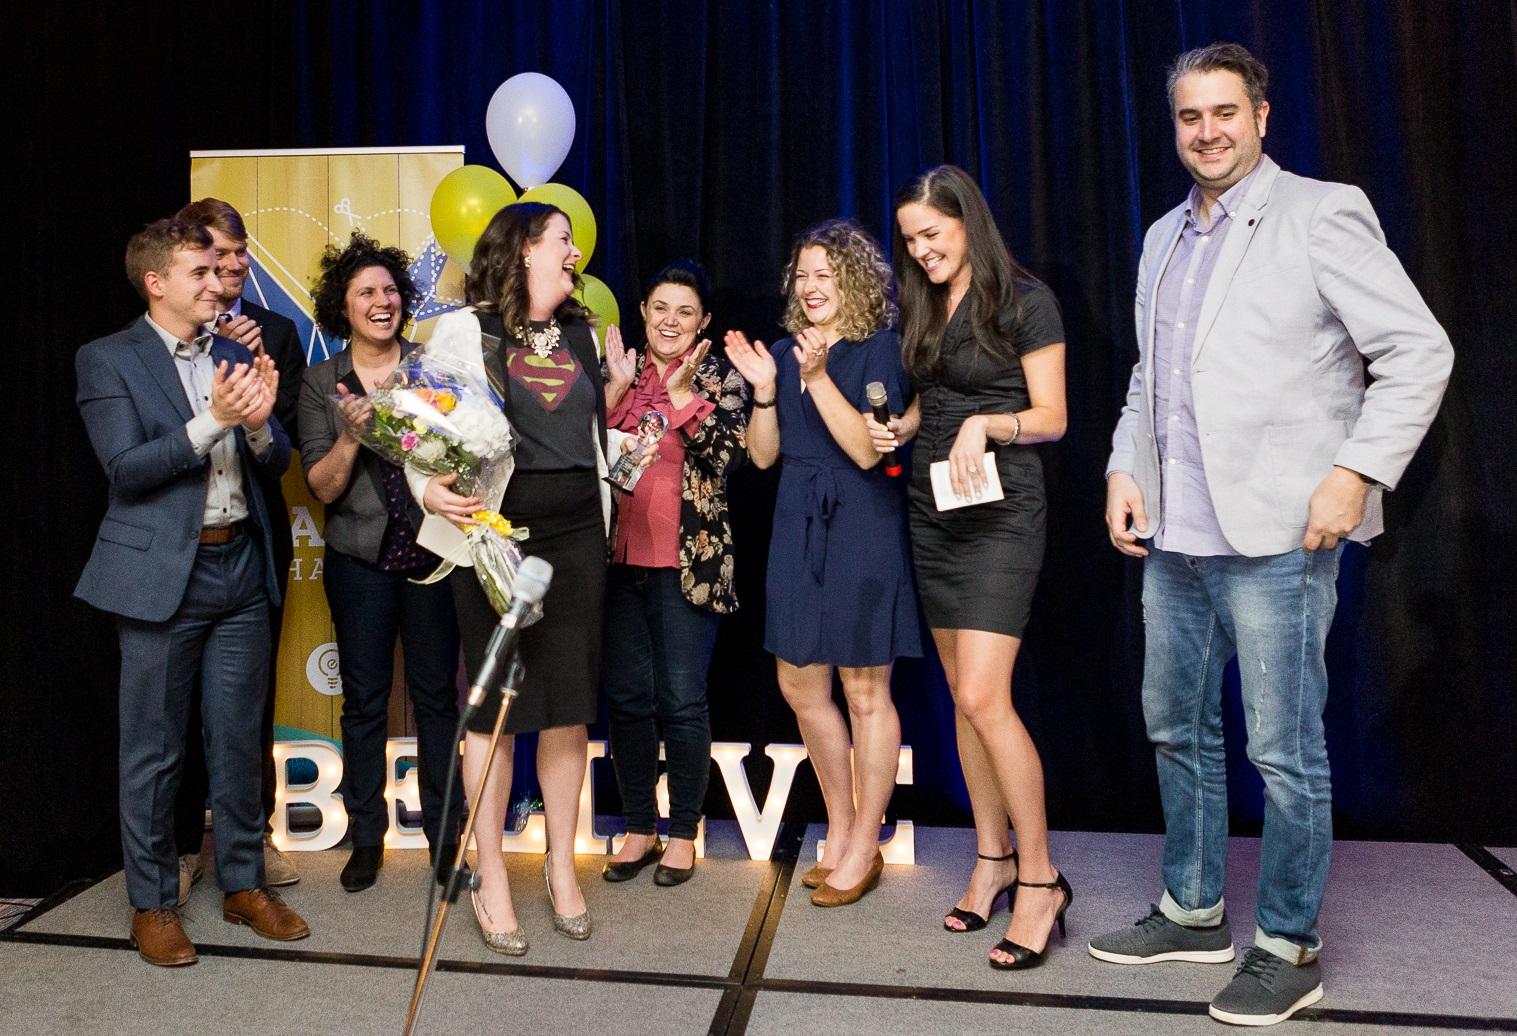 Sarah au gala du DEJ 2018 et son équipe organisatrice.